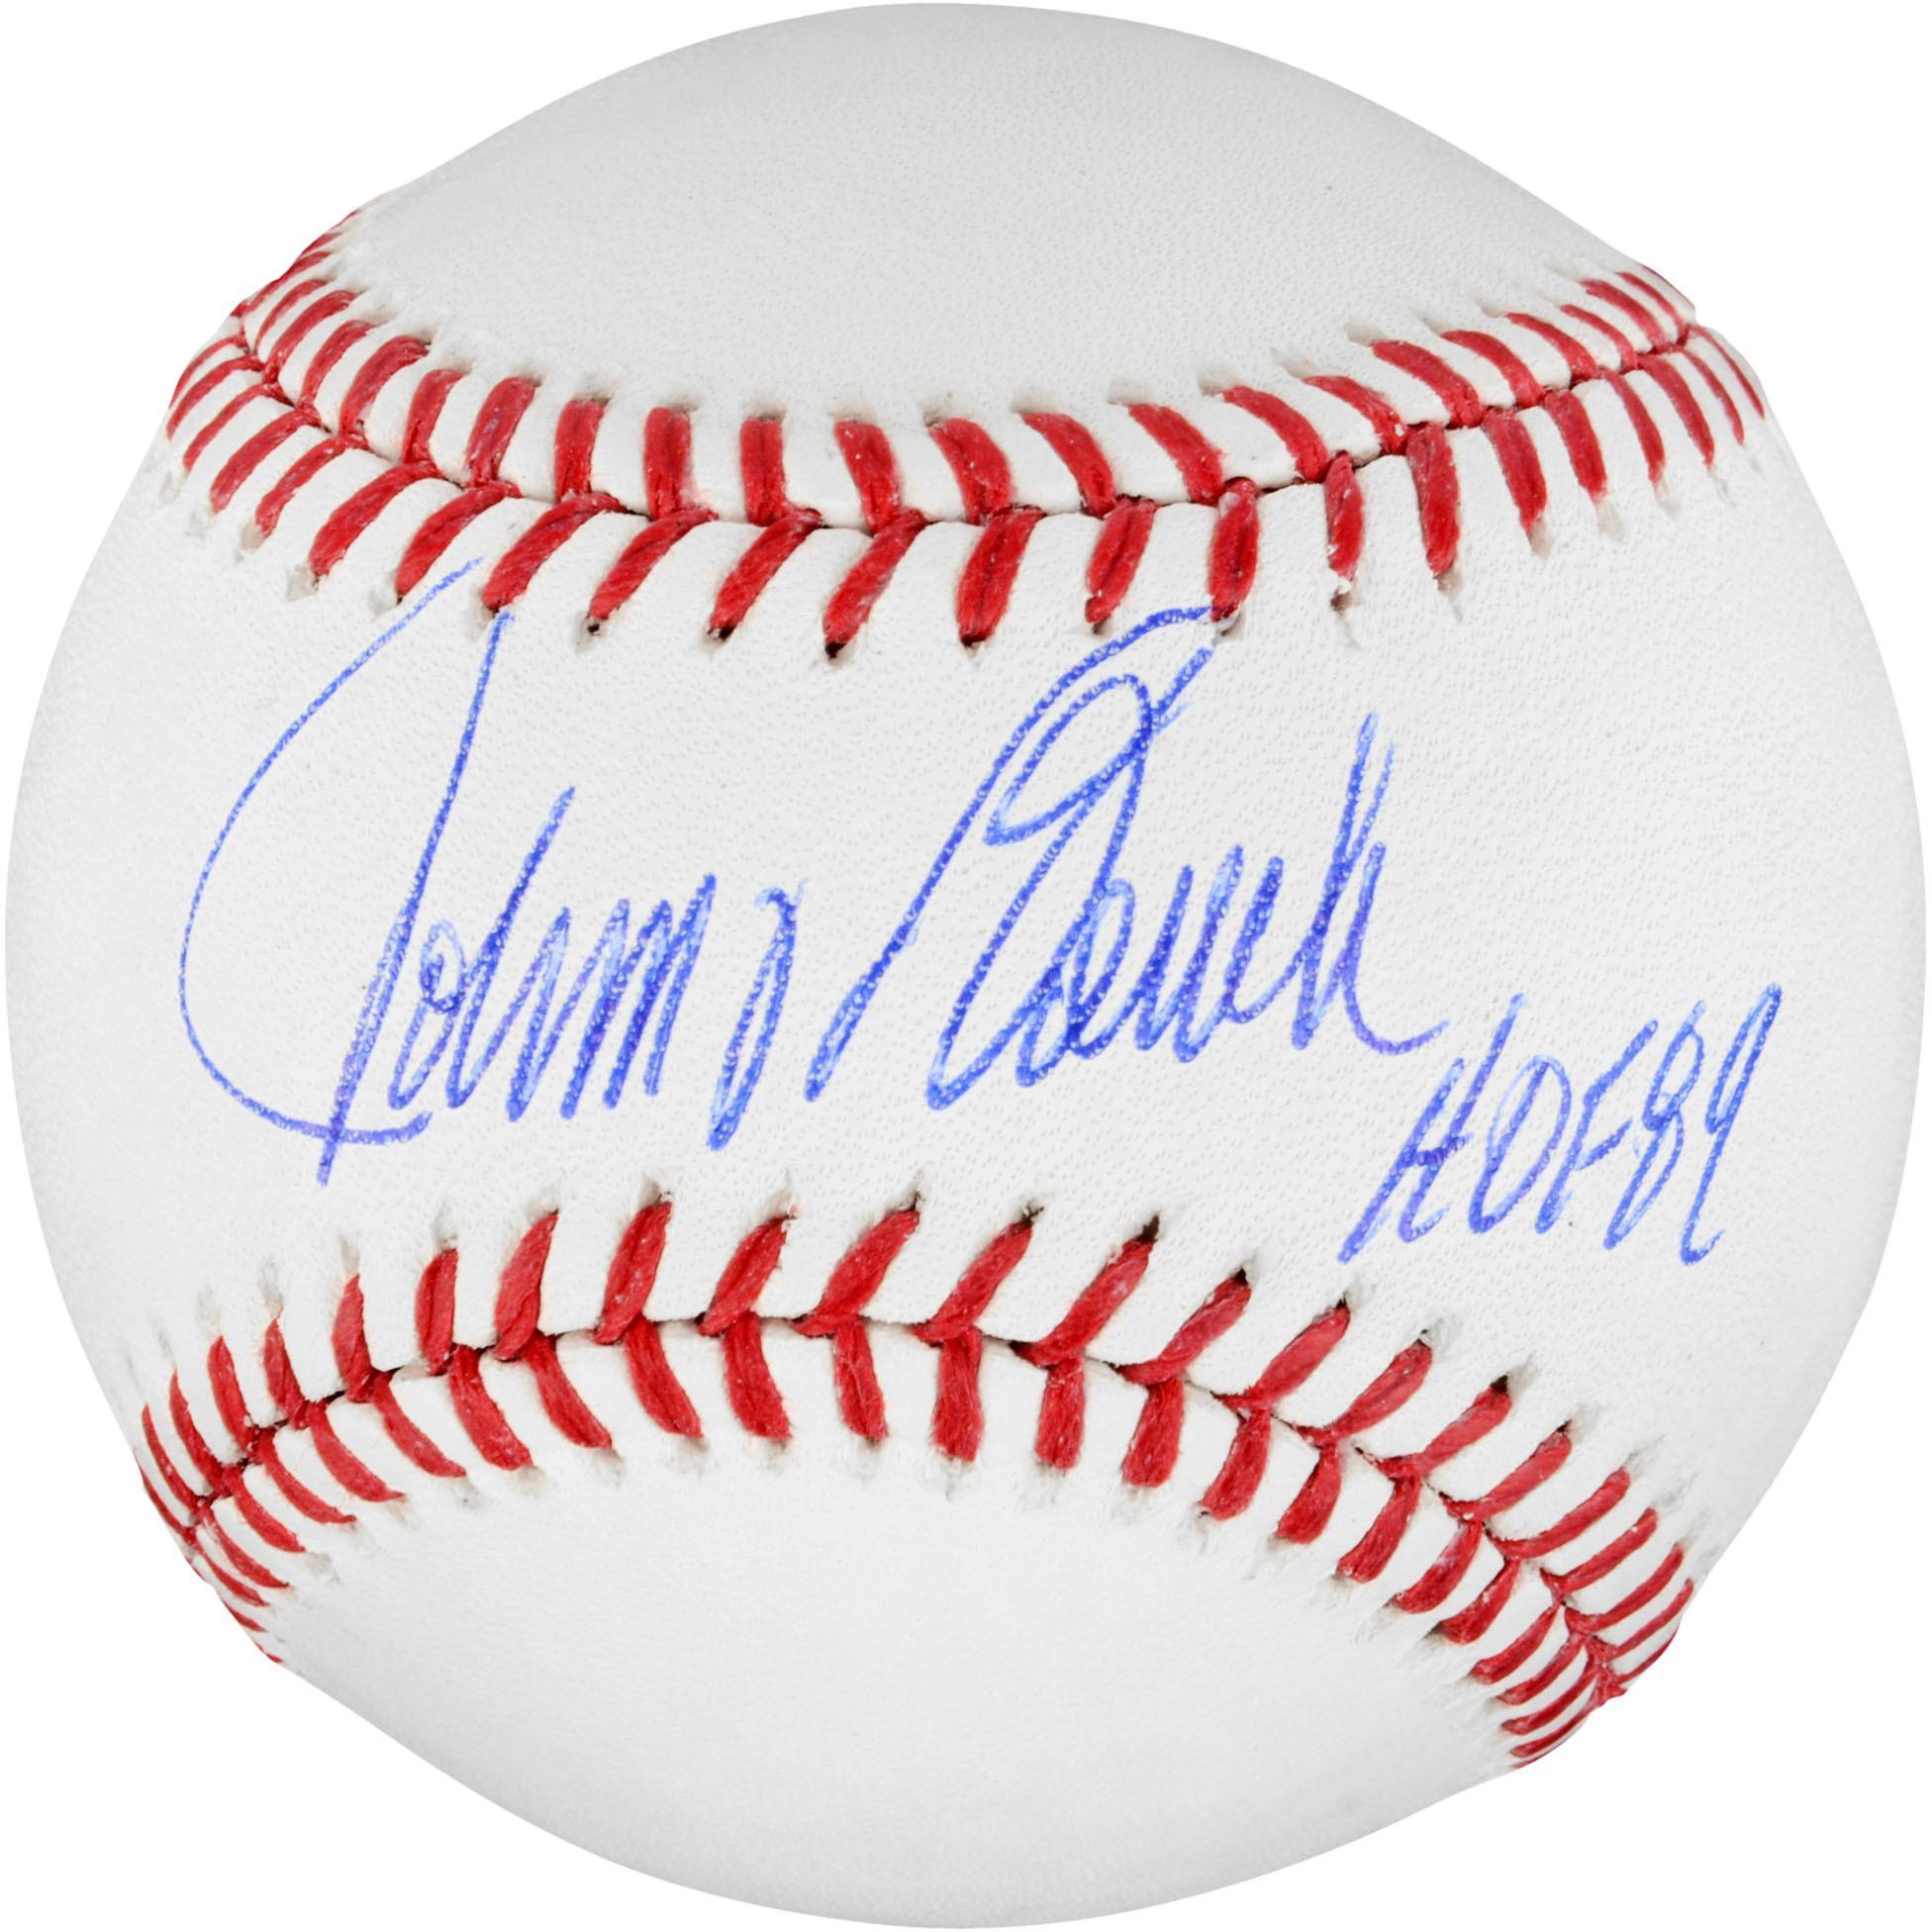 Johnny Bench Cincinnati Reds Autographed Baseball with HOF 89 Inscription